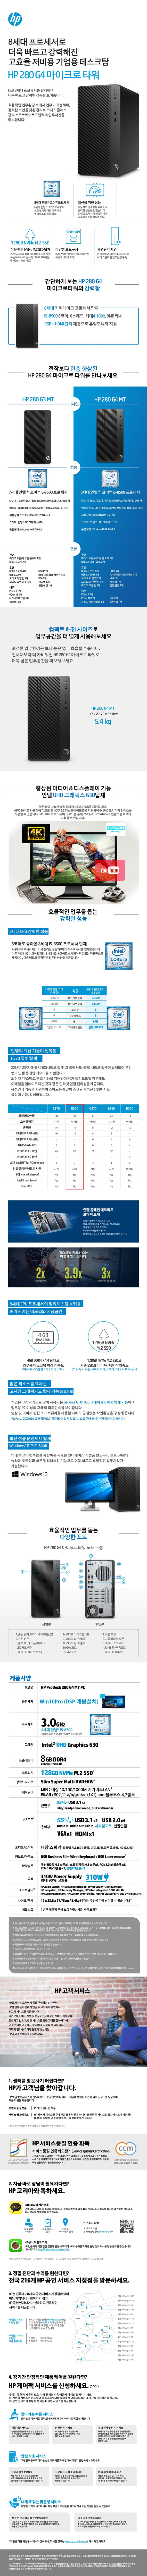 [HP] 프로데스크 280 G4 MT i5-8500 [RAM 8GB/NVMe 128GB/Win 10 Pro(DSP 개봉설치)]